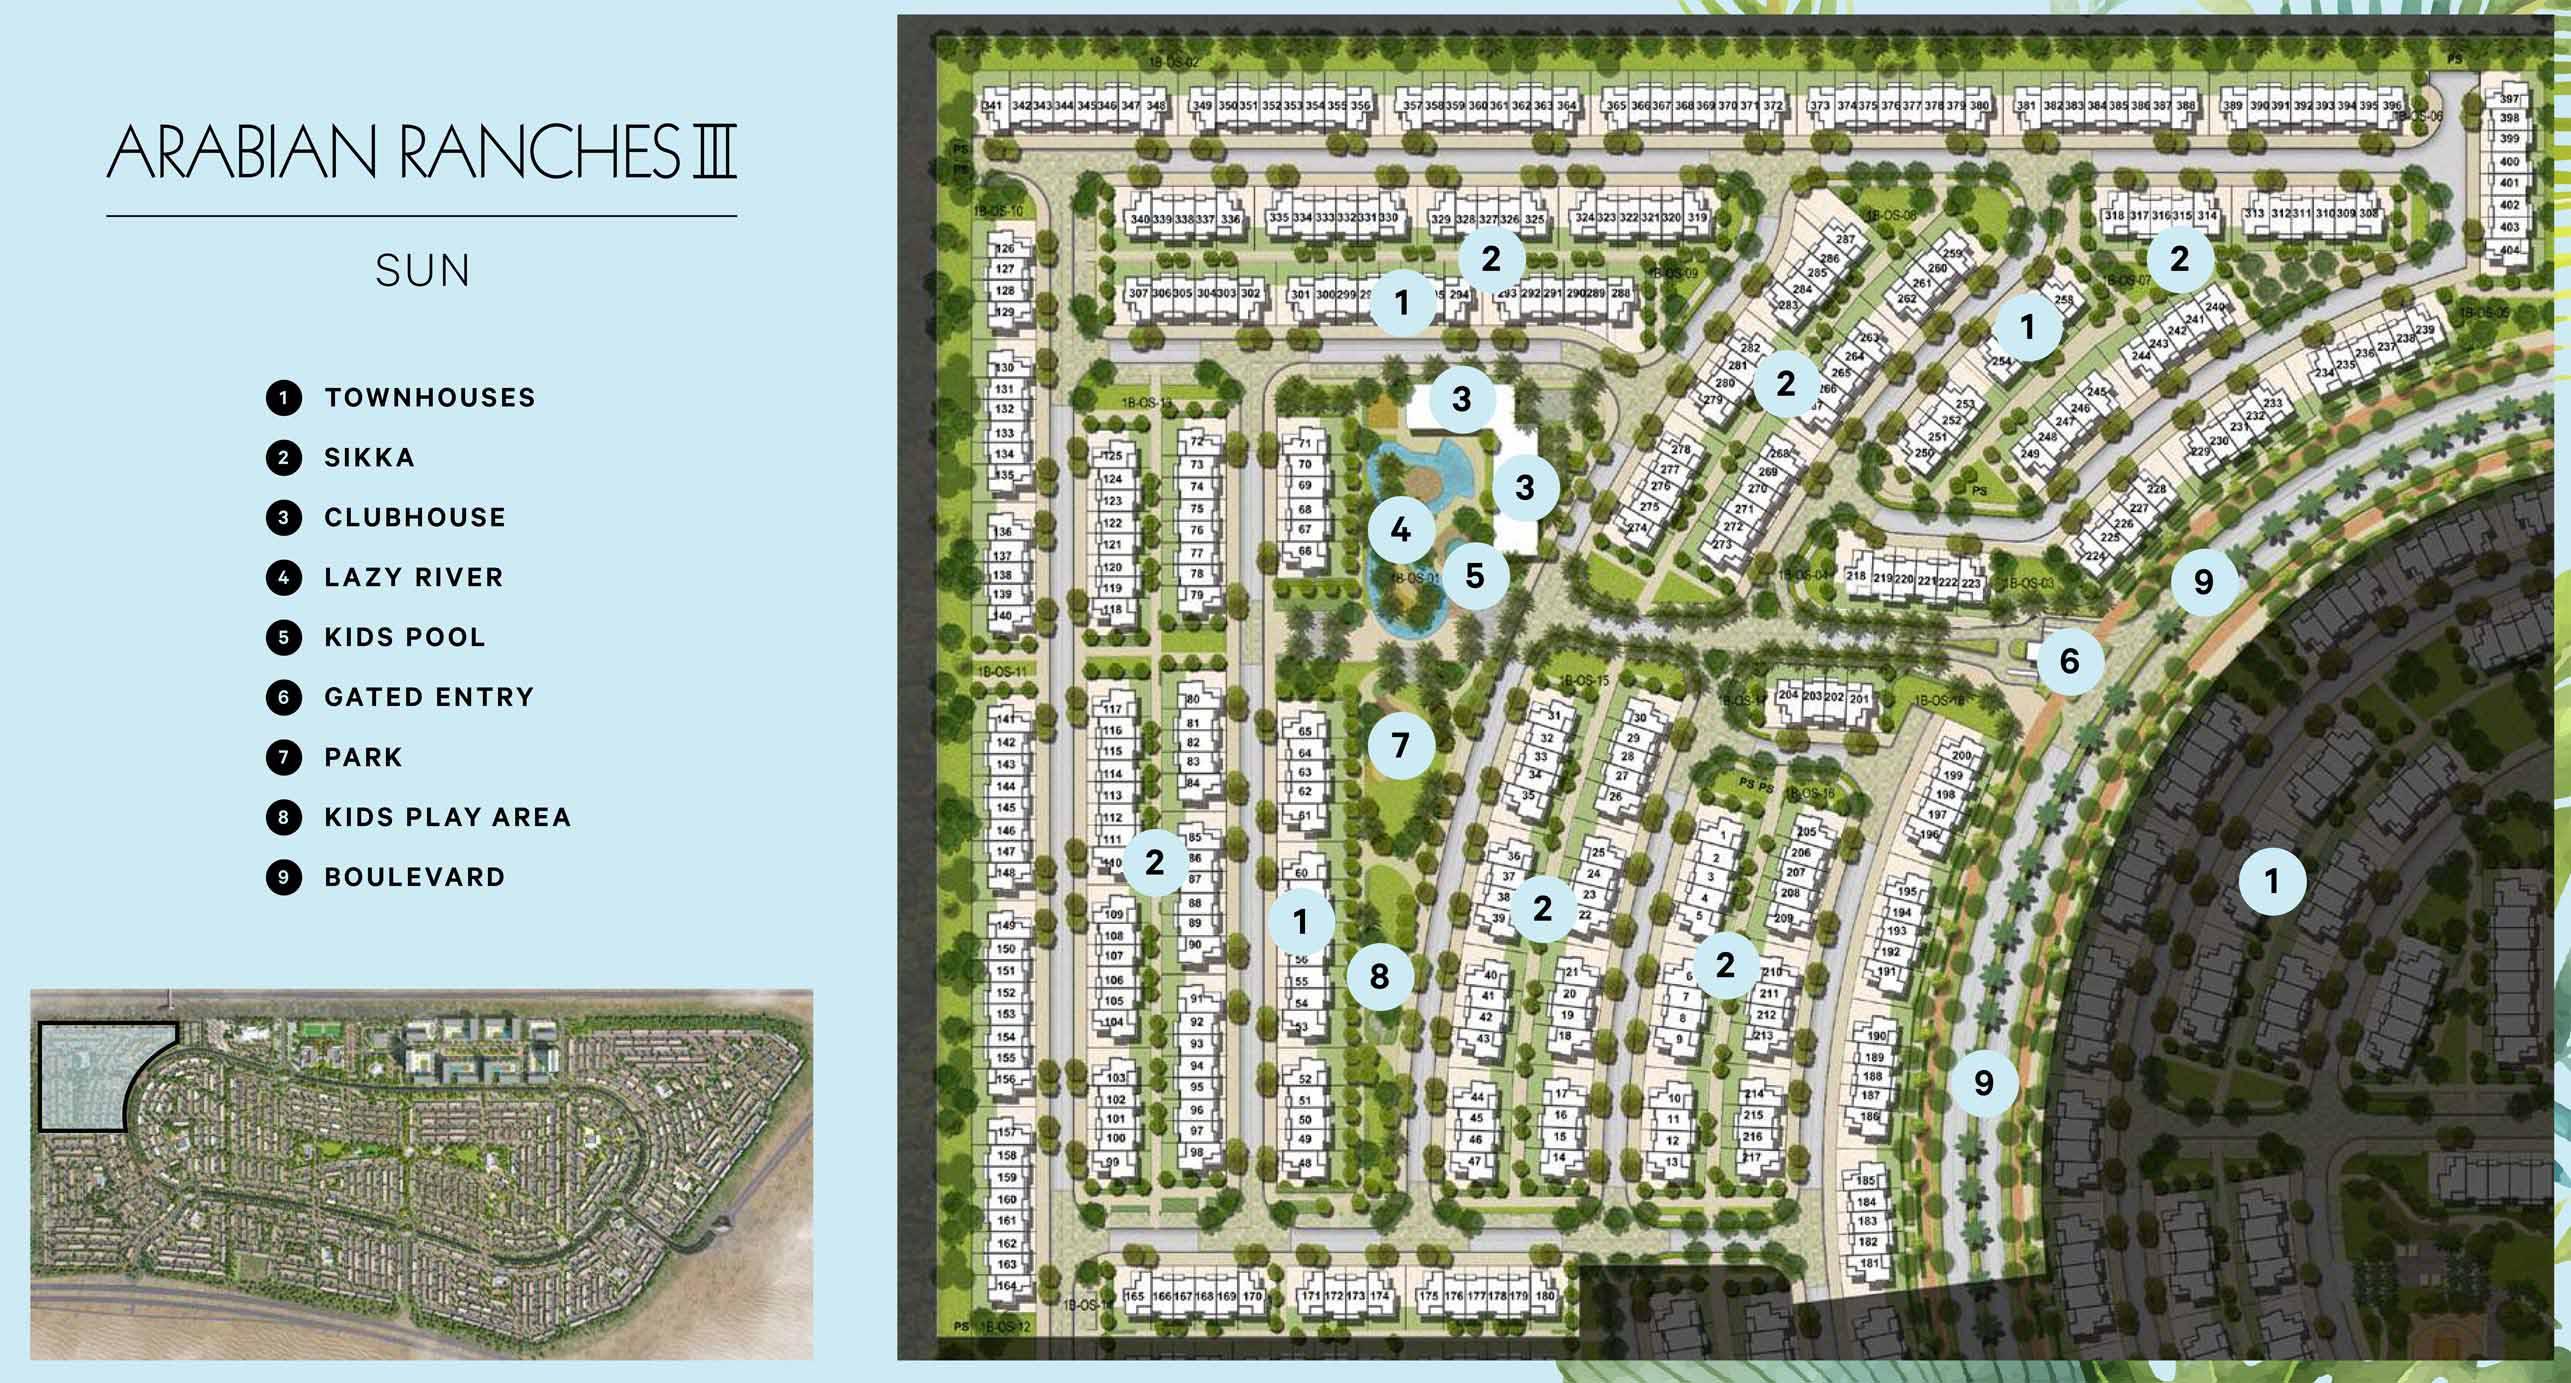 Emaar-Sun-Townhouses-at-Arabian-Ranches-III Master Plan